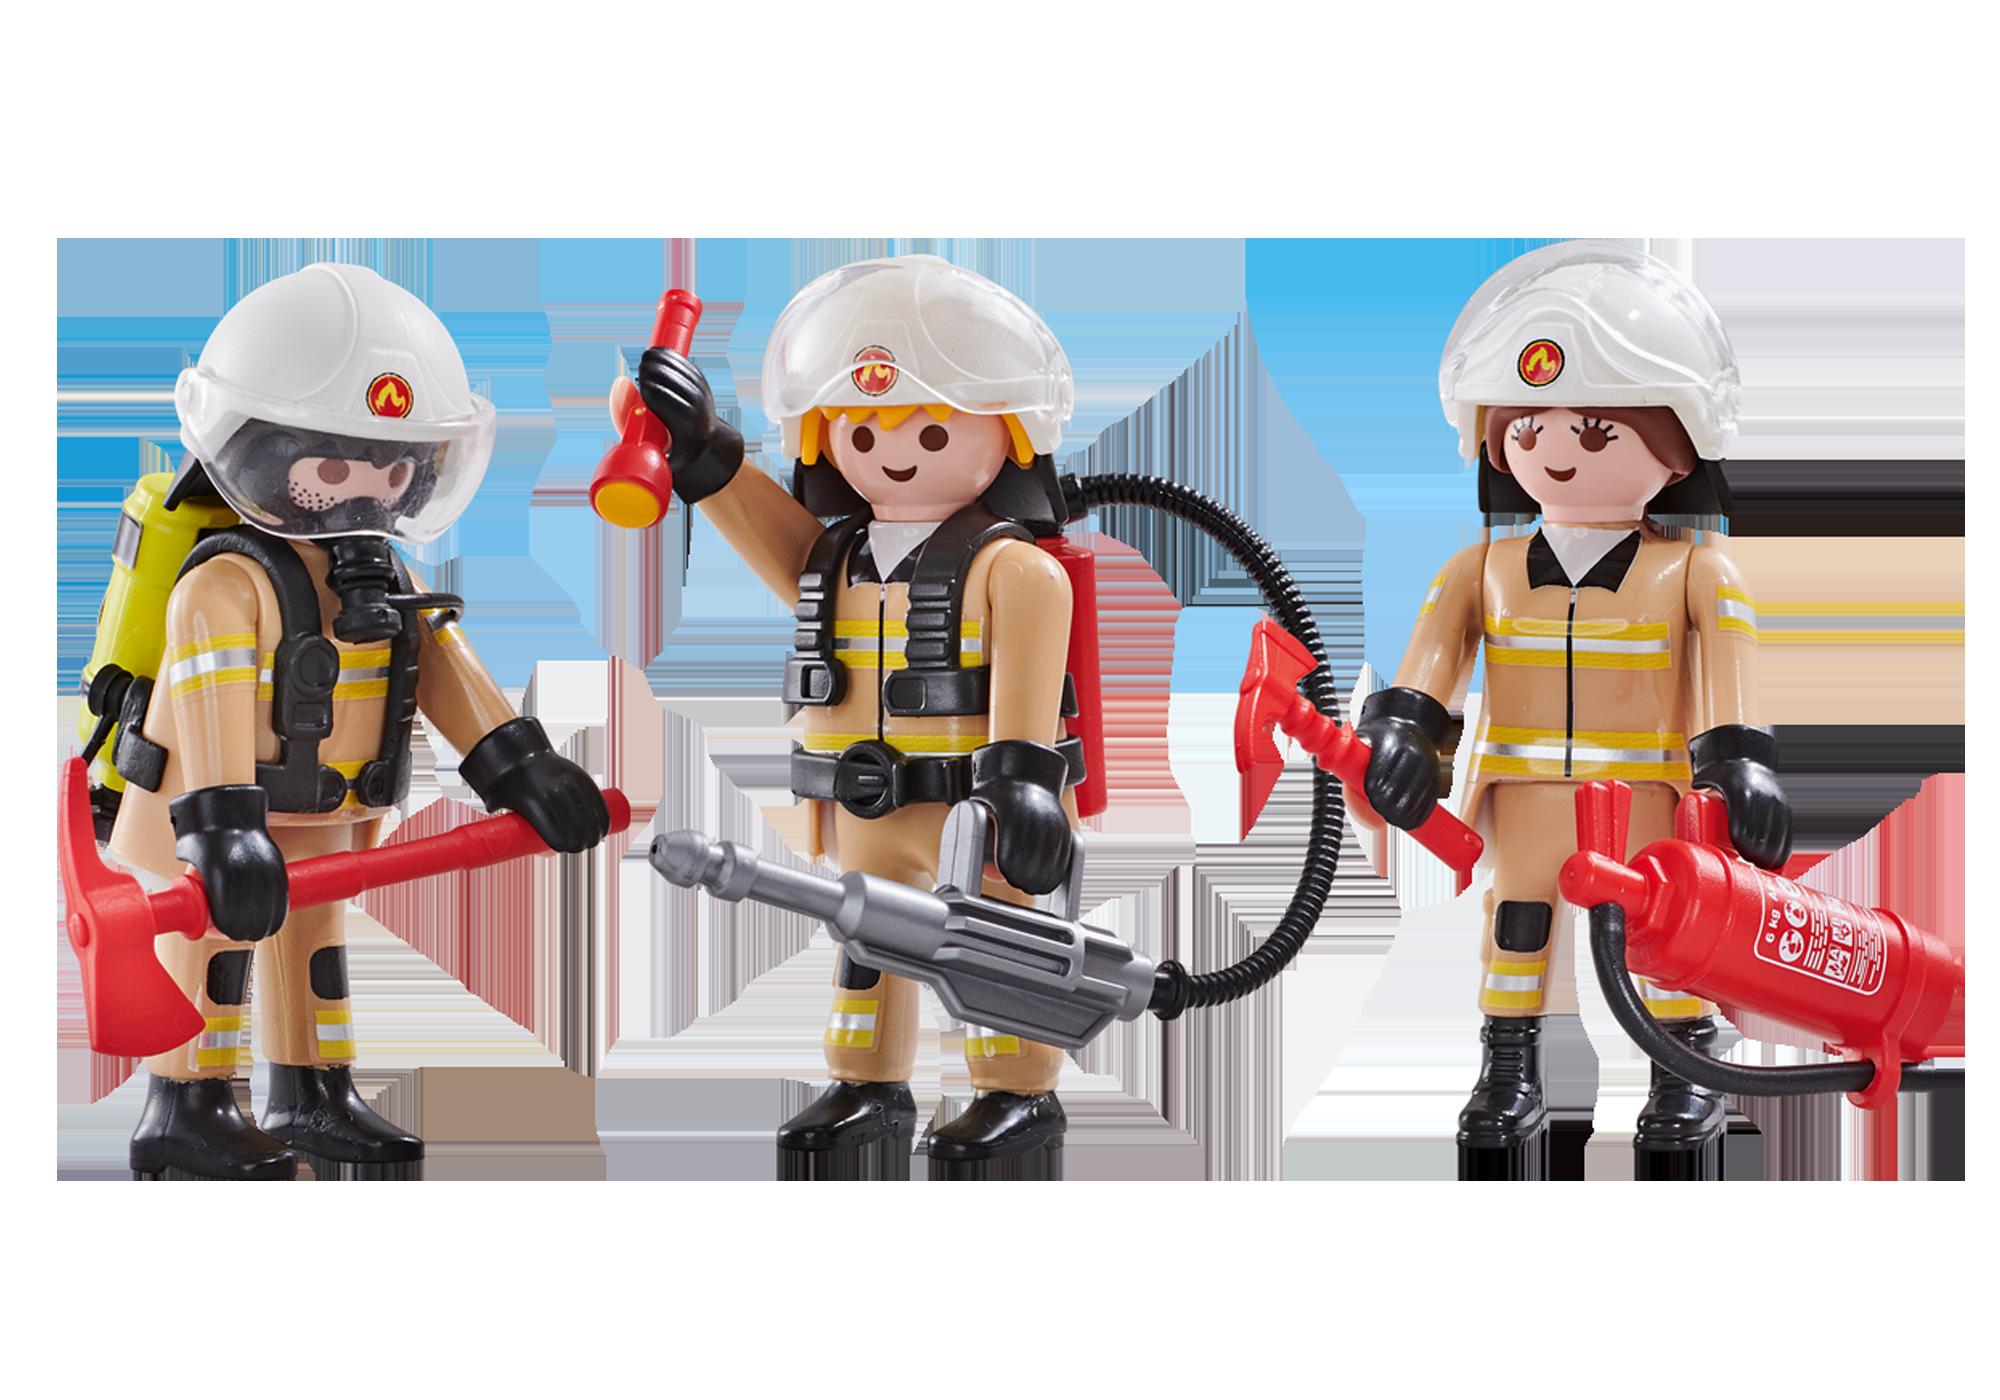 http://media.playmobil.com/i/playmobil/6584_product_detail/Brigade A Firefighters